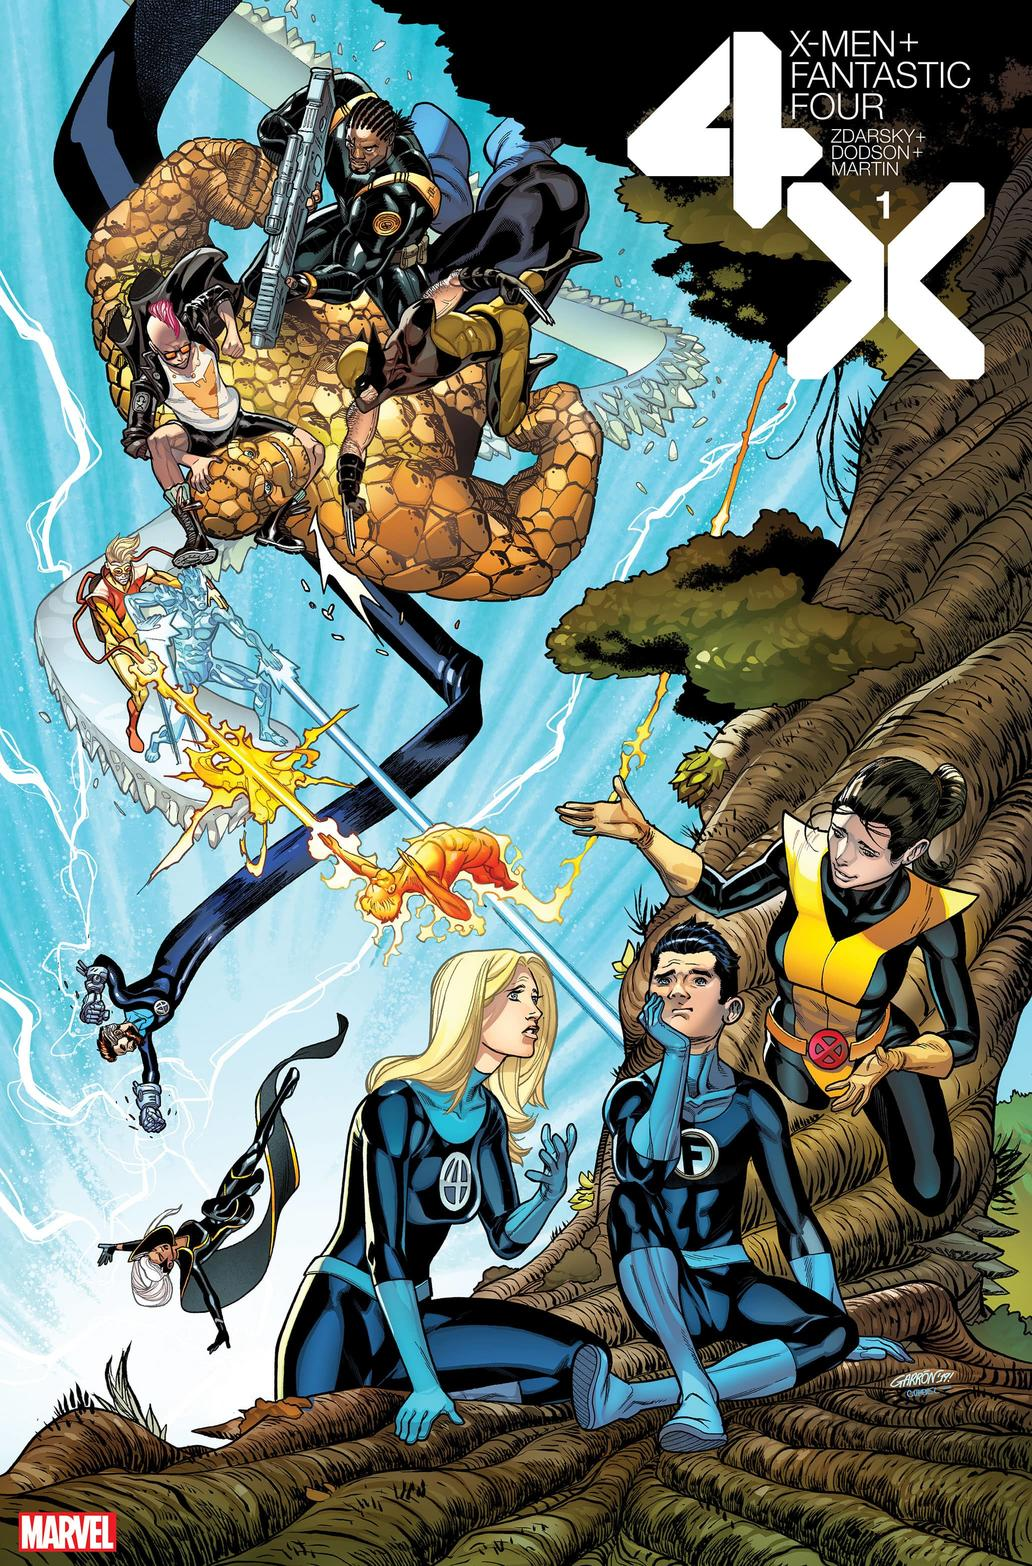 X-MEN/FANTASTIC FOUR variant cover by Javier Garron